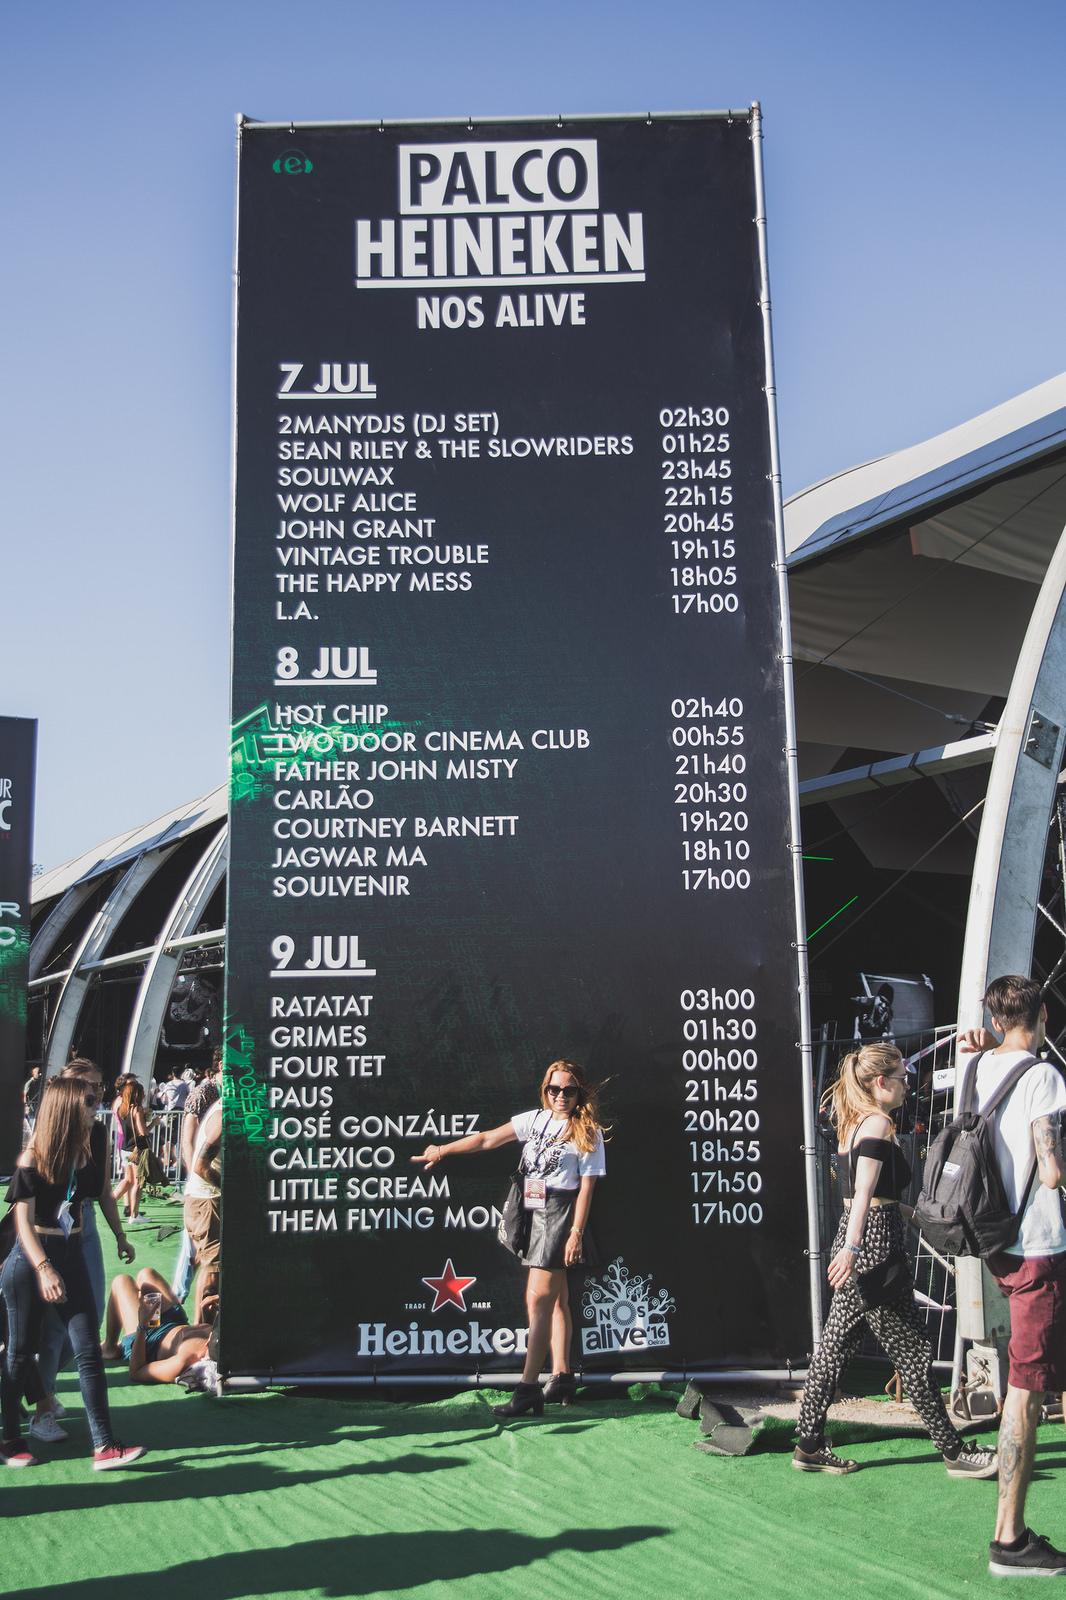 nos alive lisboa 2016 festival silvia orduna 16